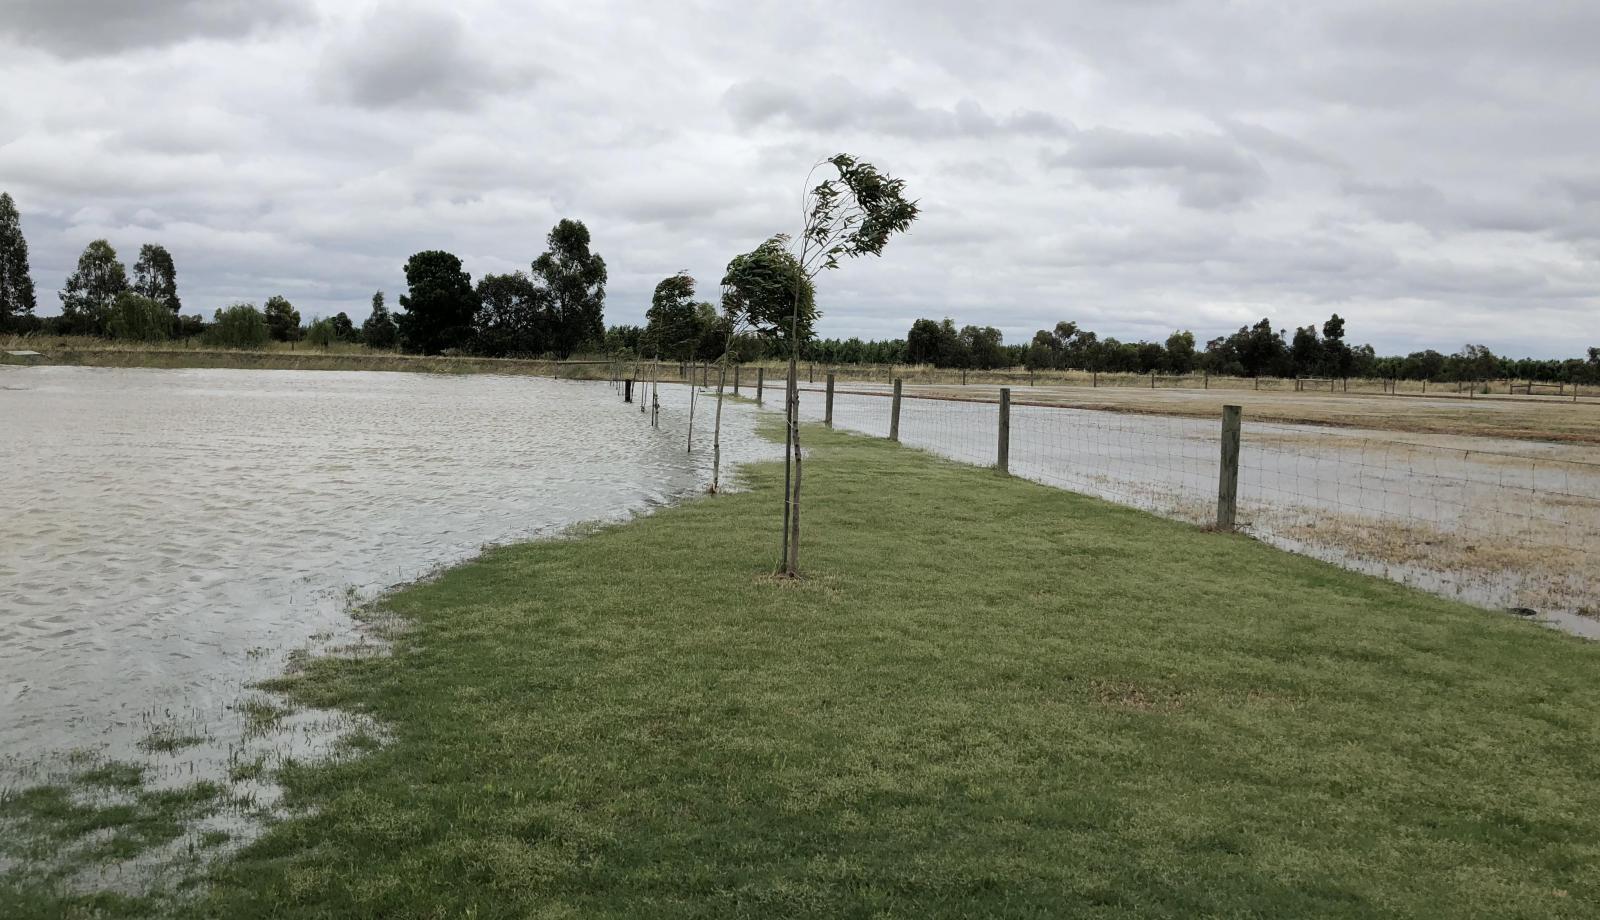 GALLERY: Flooding around the paddocks